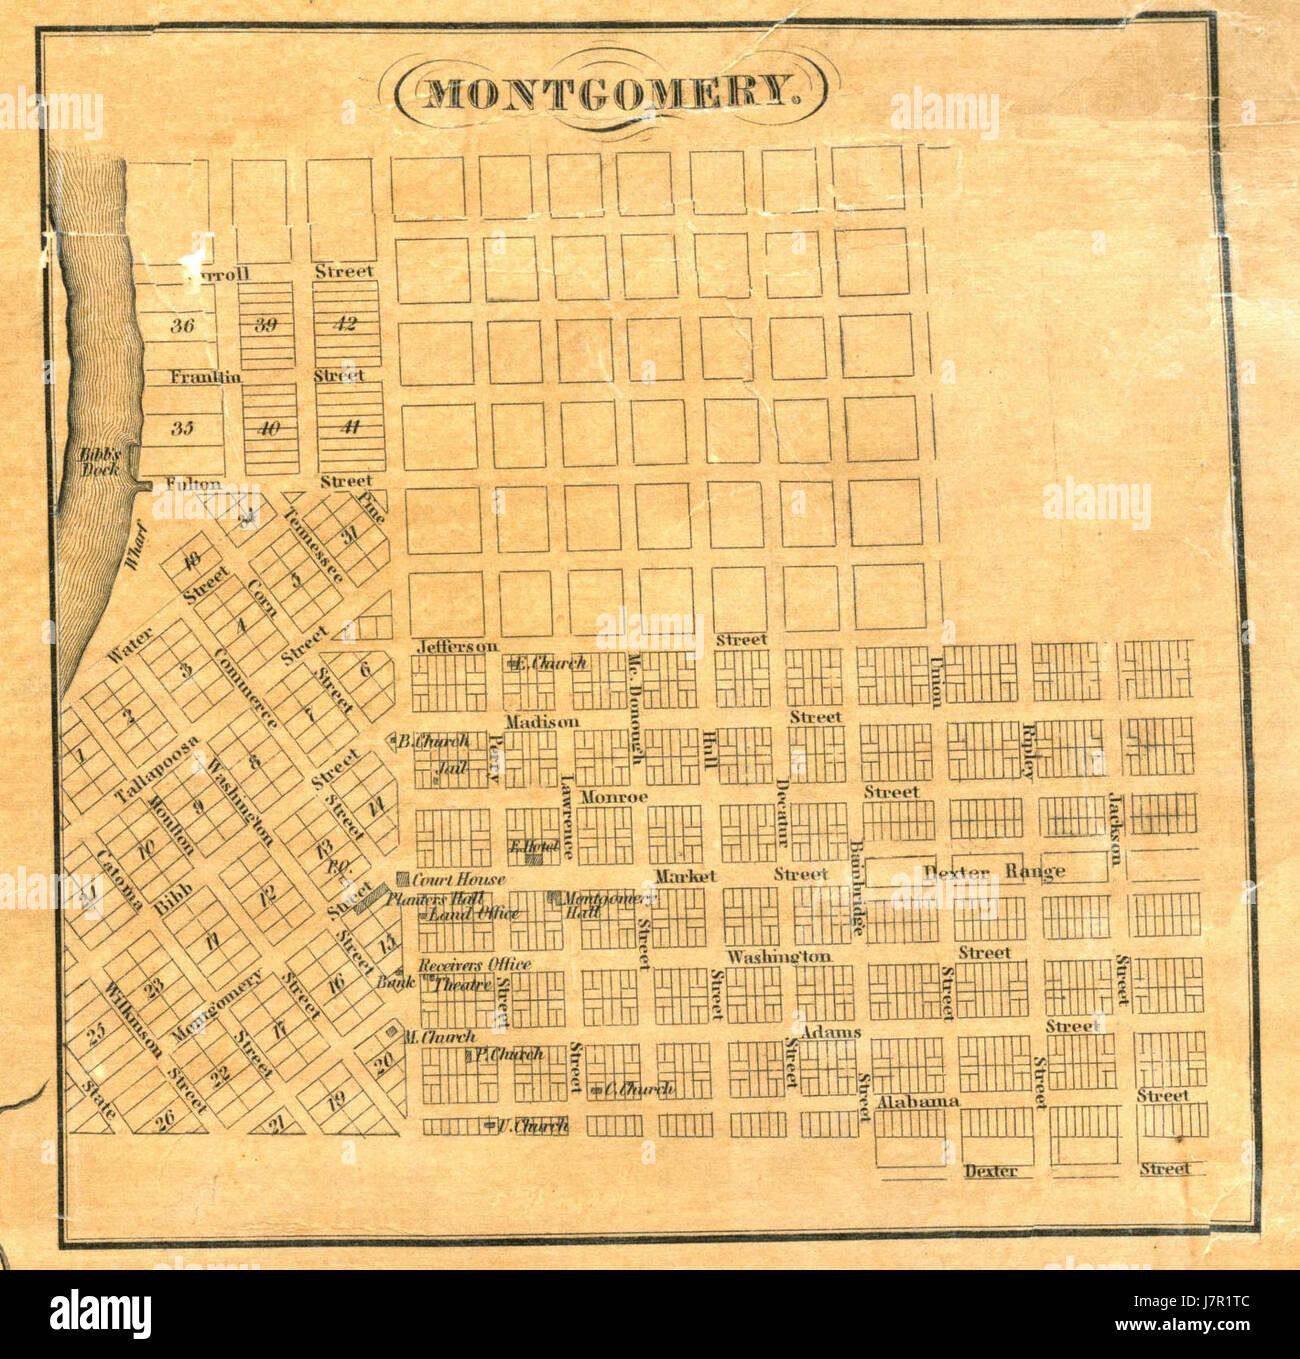 1837 Map of Montgomery, Alabama Stock Photo: 142491900 - Alamy